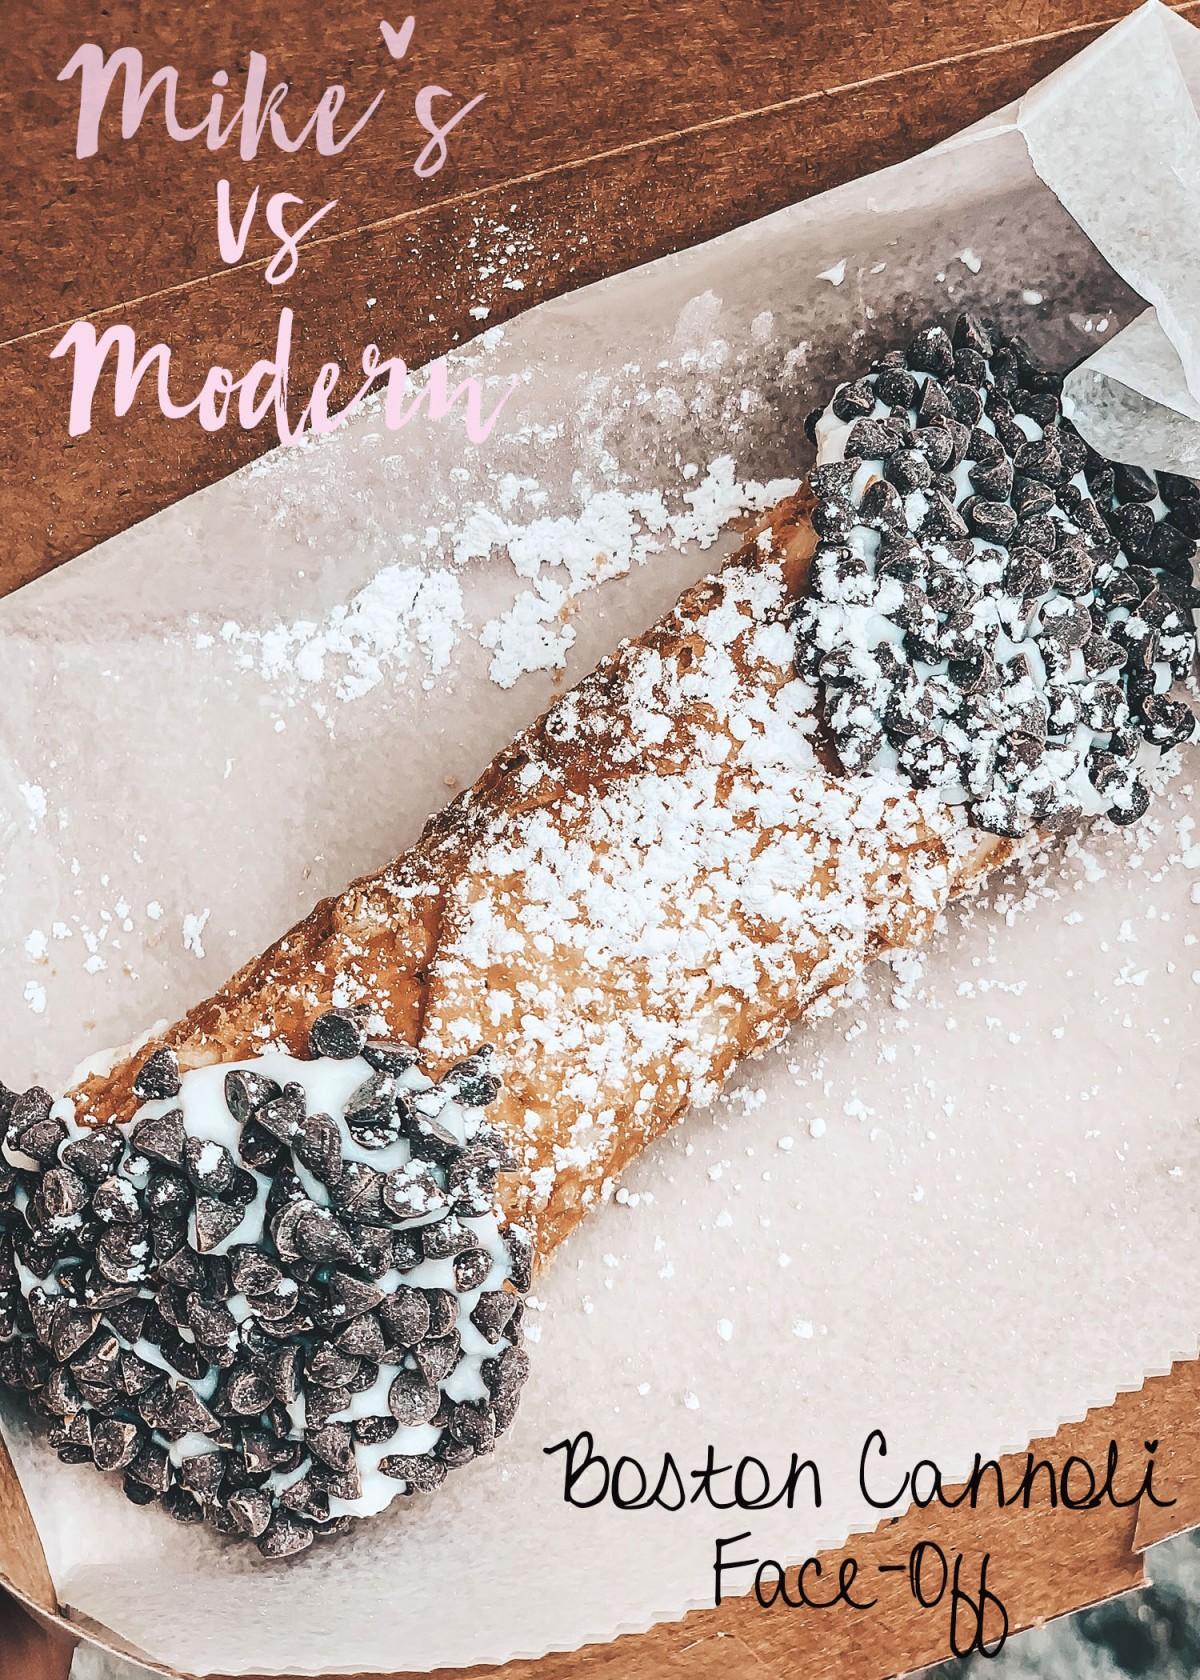 Mike's Pastry vs. ModernPastry